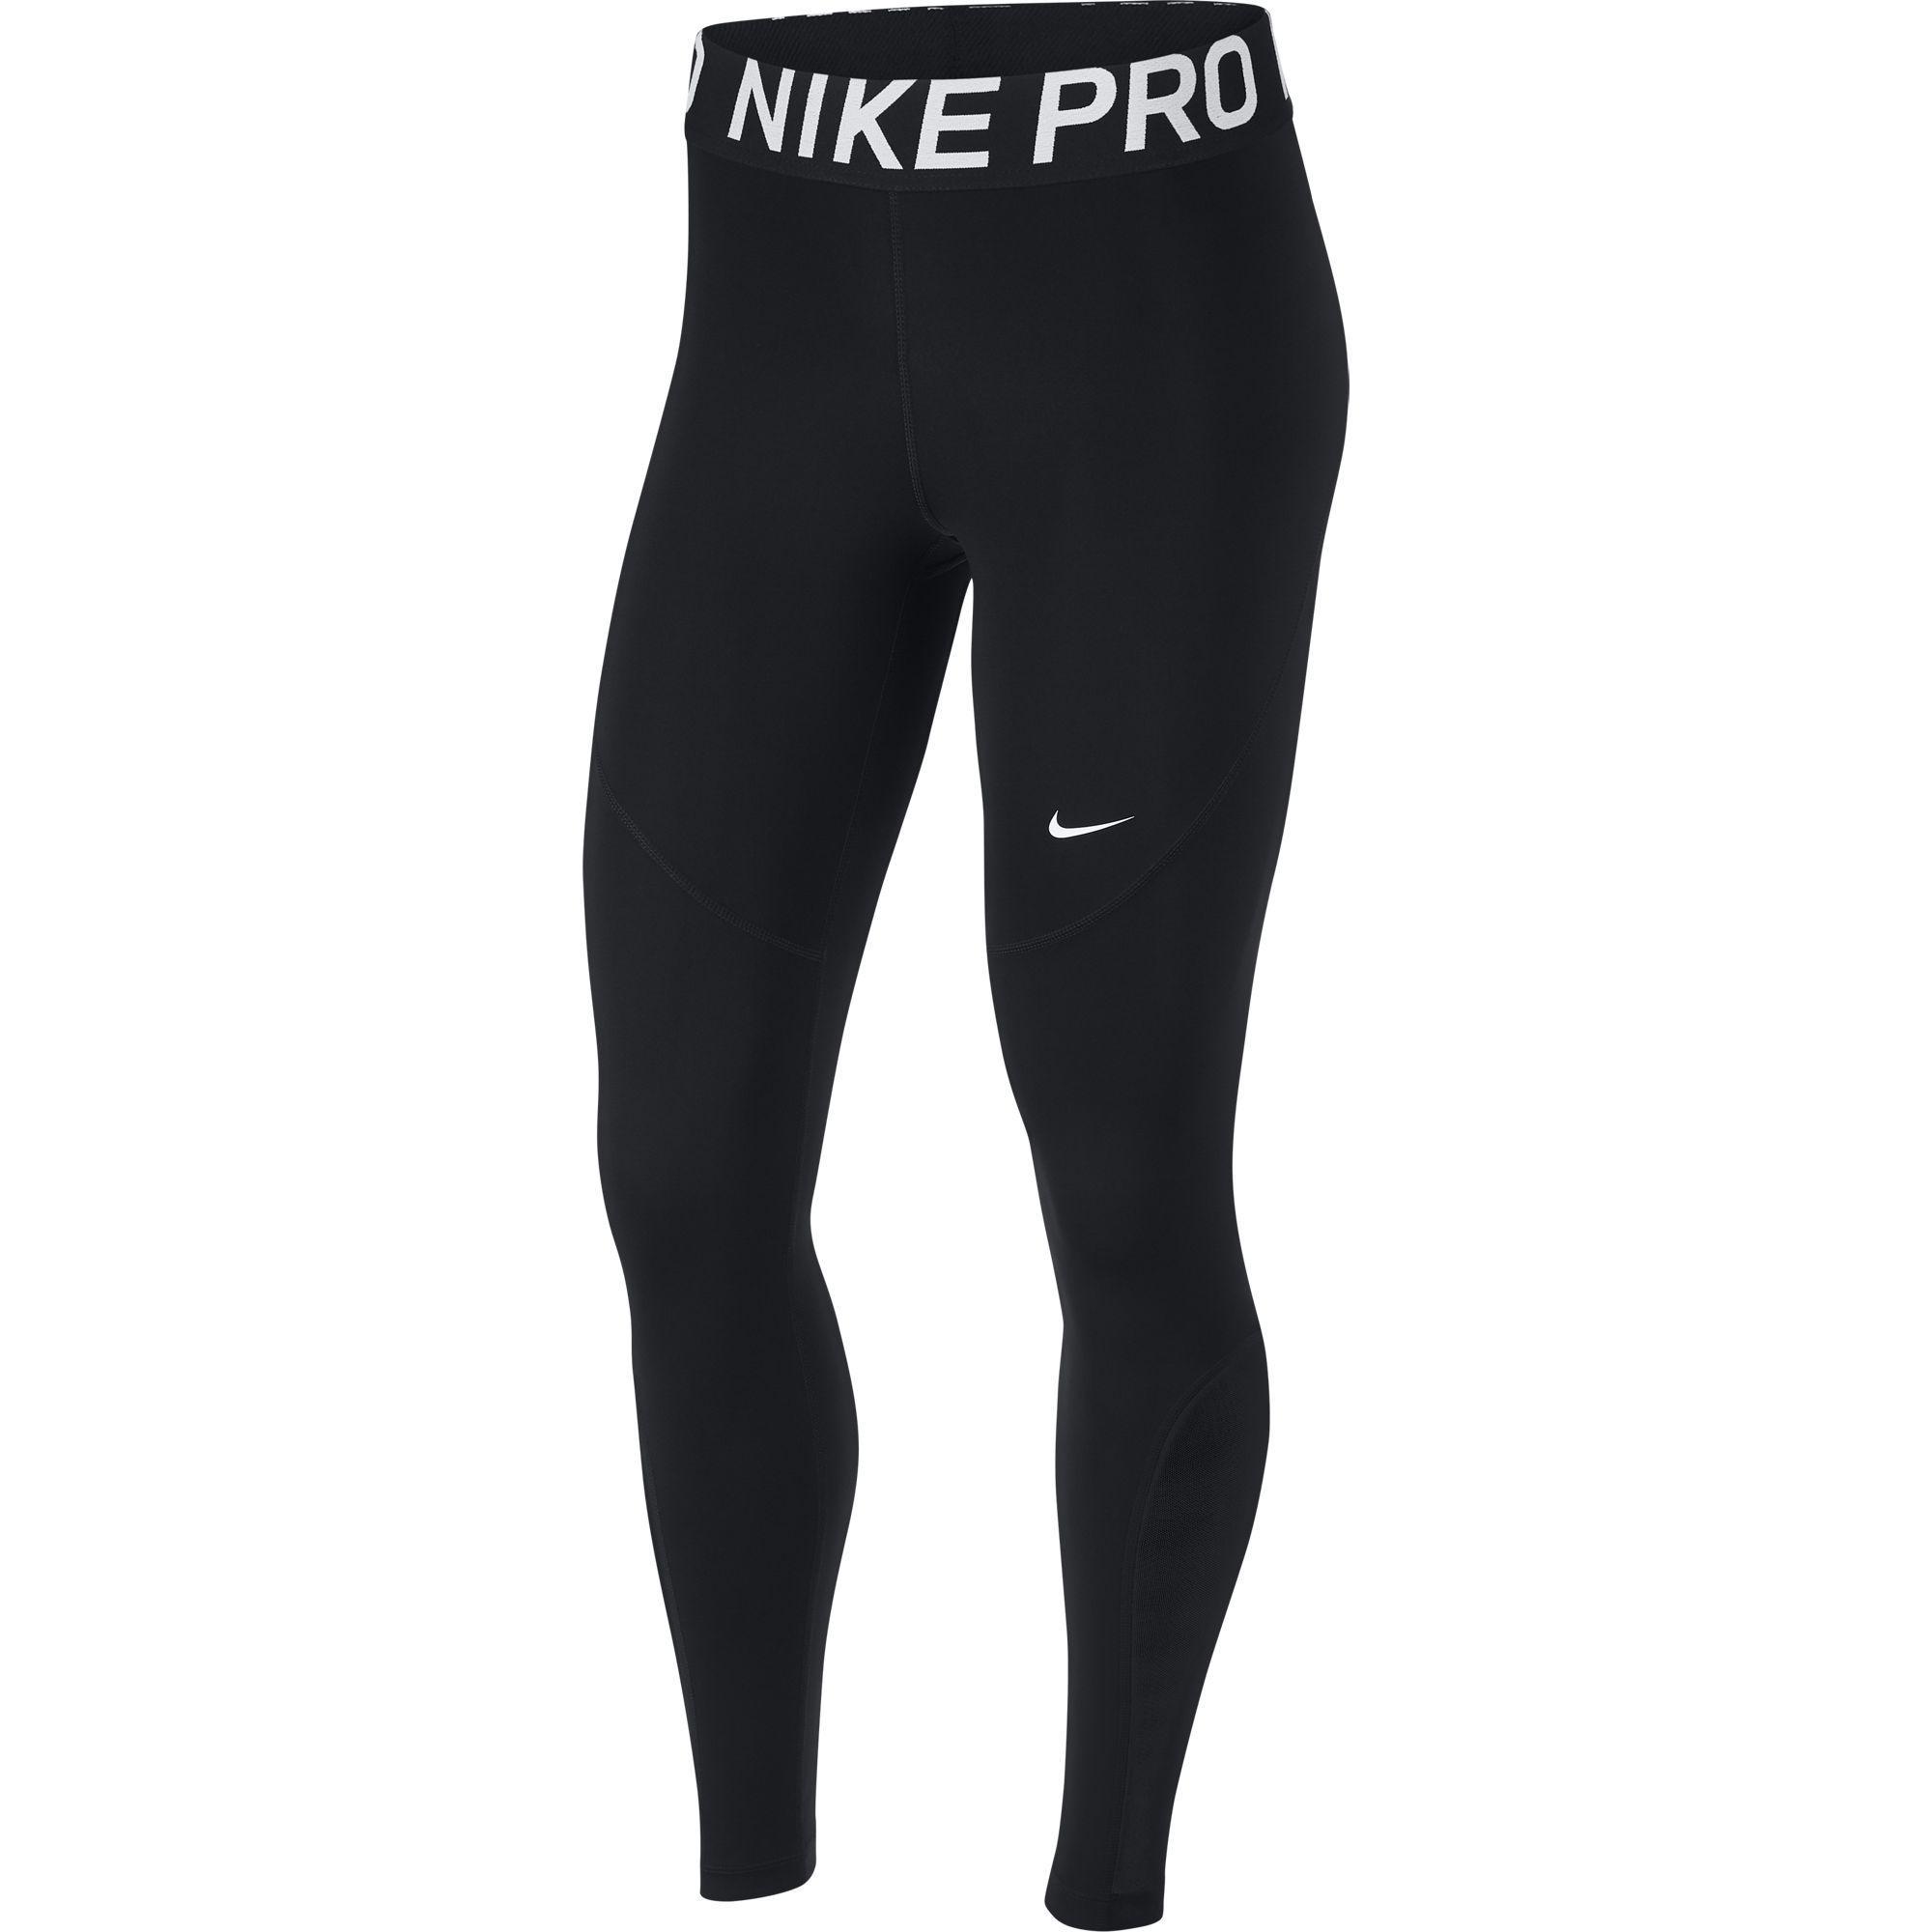 dc6726199b70e Nike Womens Pro Tights - Black/White - Tennisnuts.com